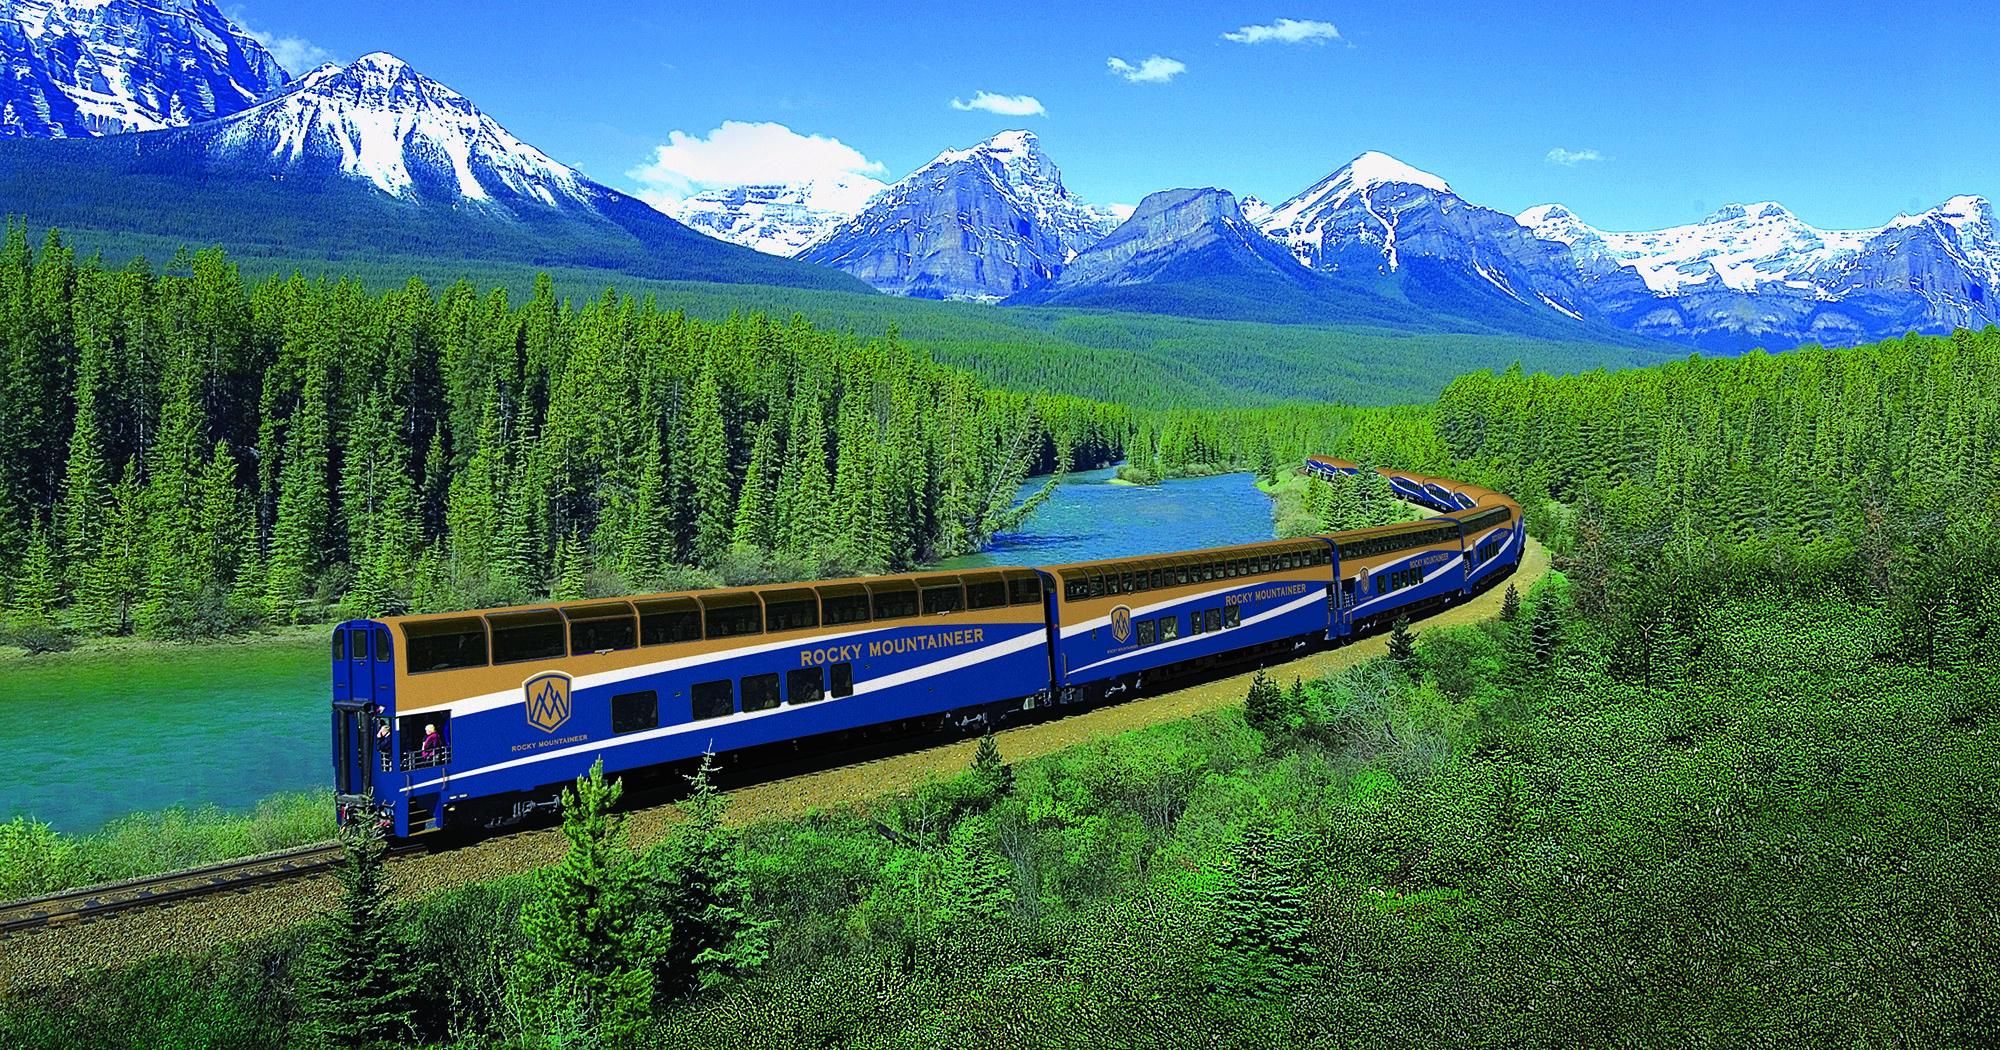 قطار روسيا